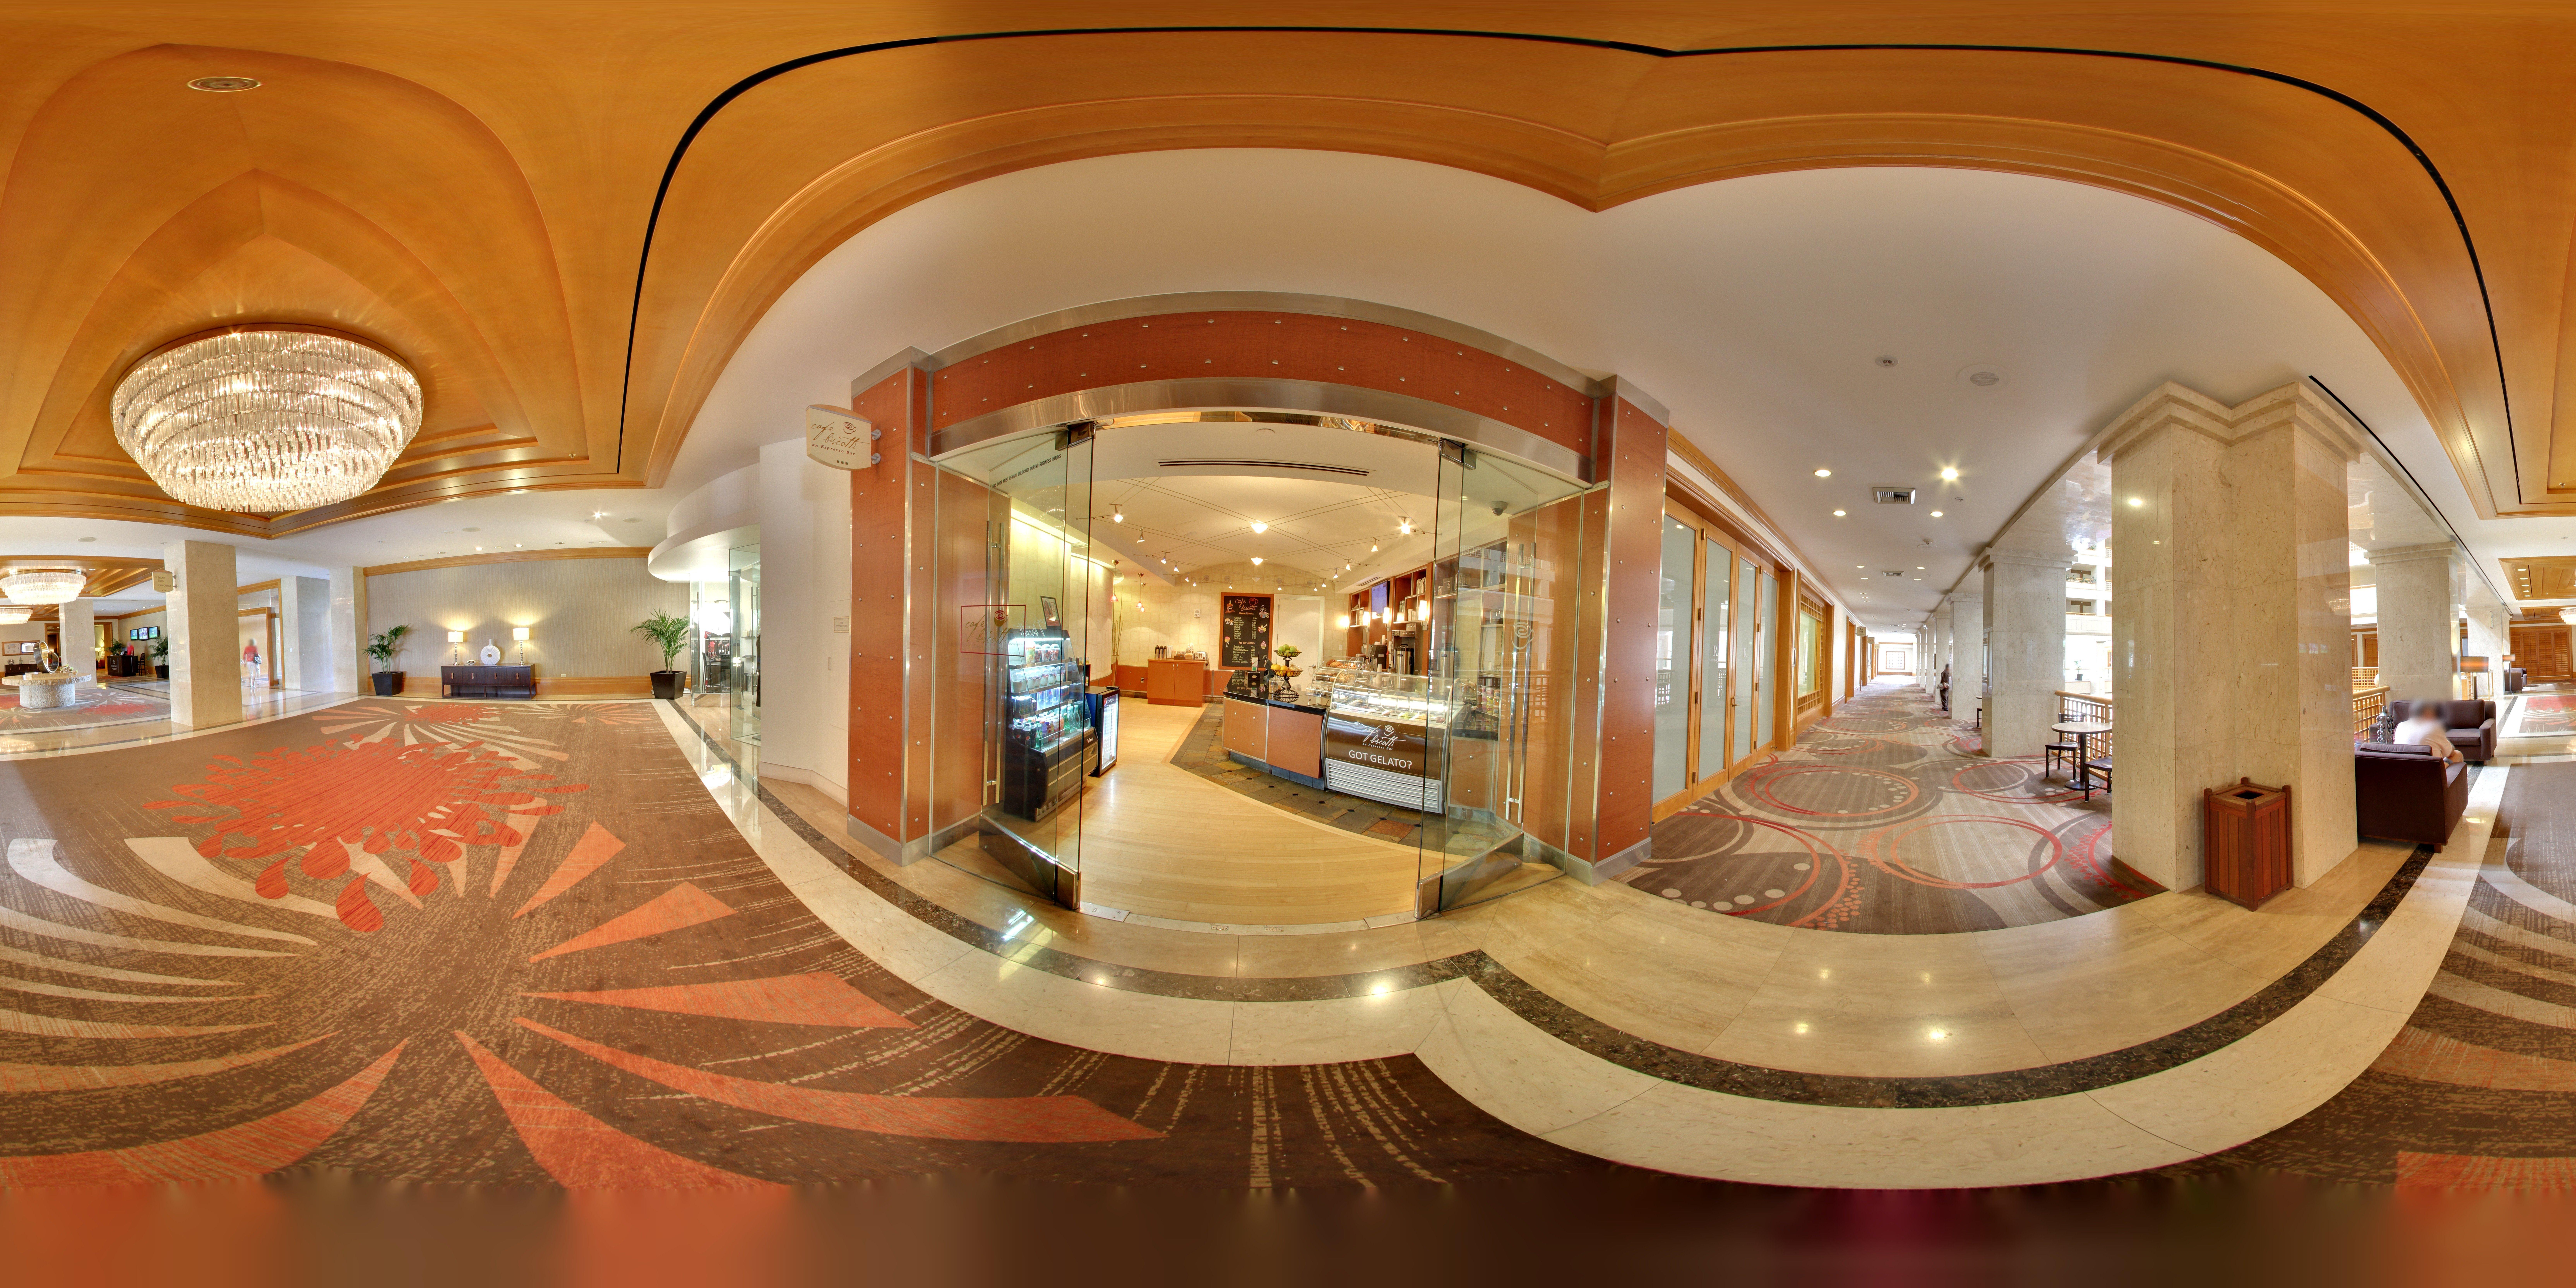 Renaissance Indian Wells Resort & Spa image 44